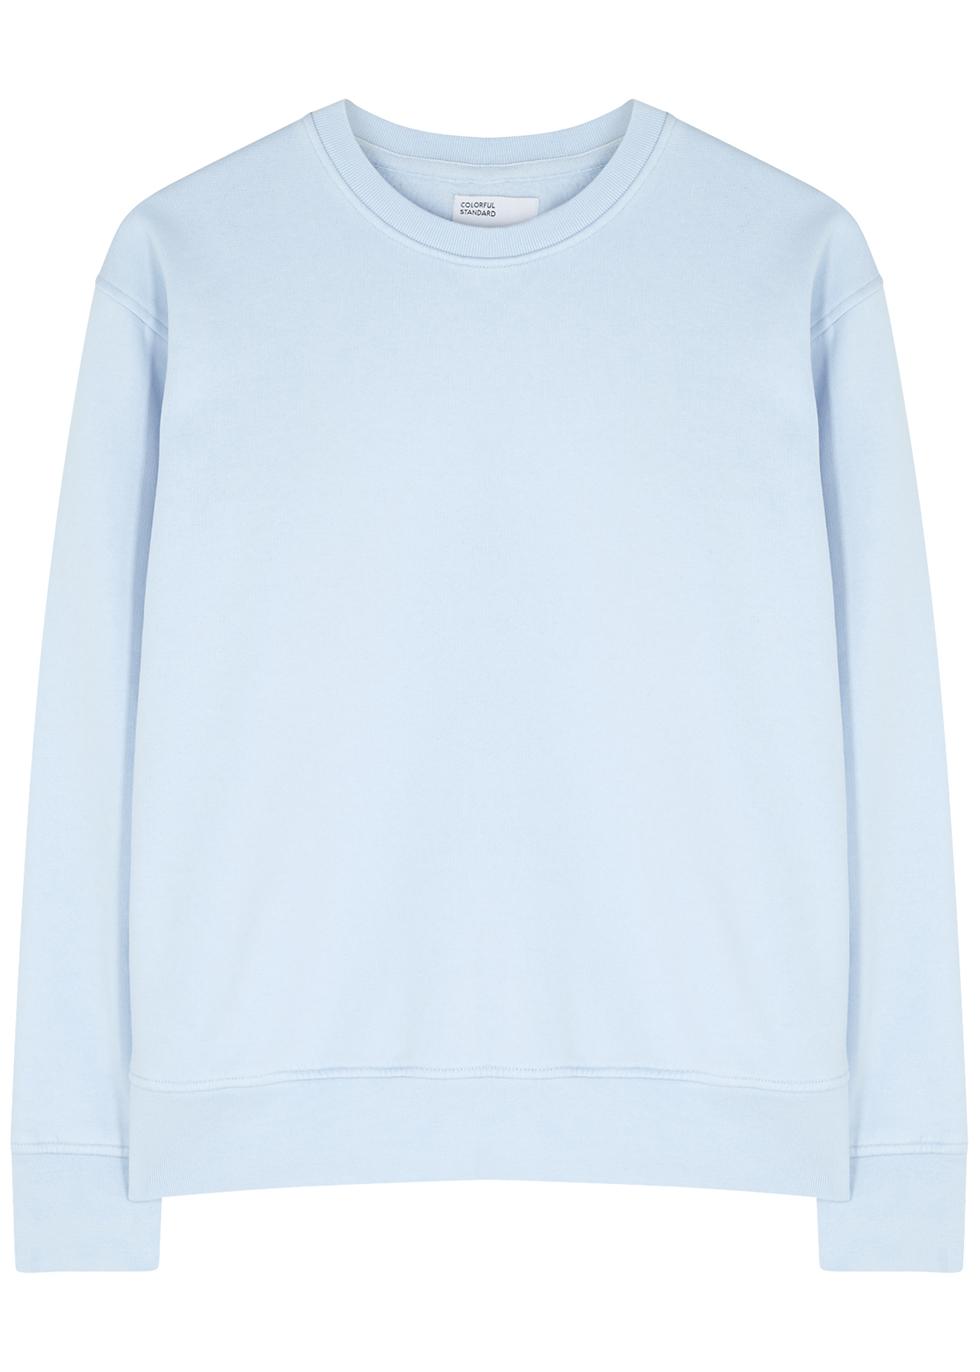 Light blue cotton sweatshirt